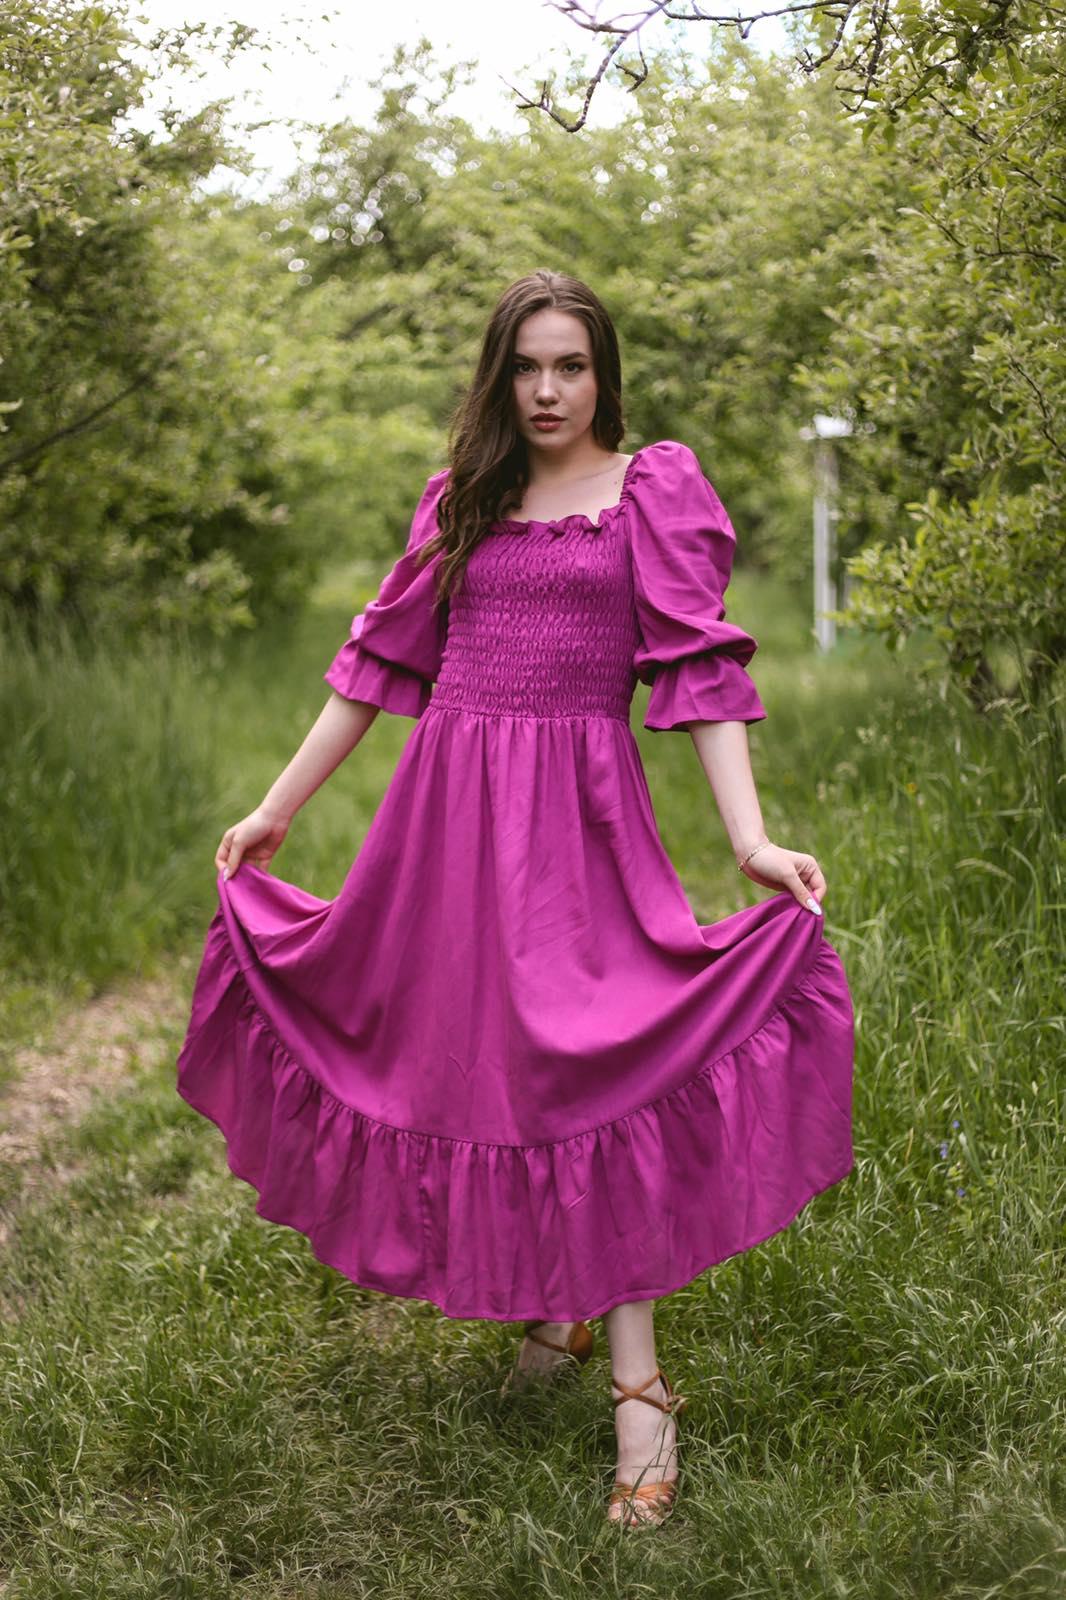 Платье с лифом на резинке в фуксия цвете